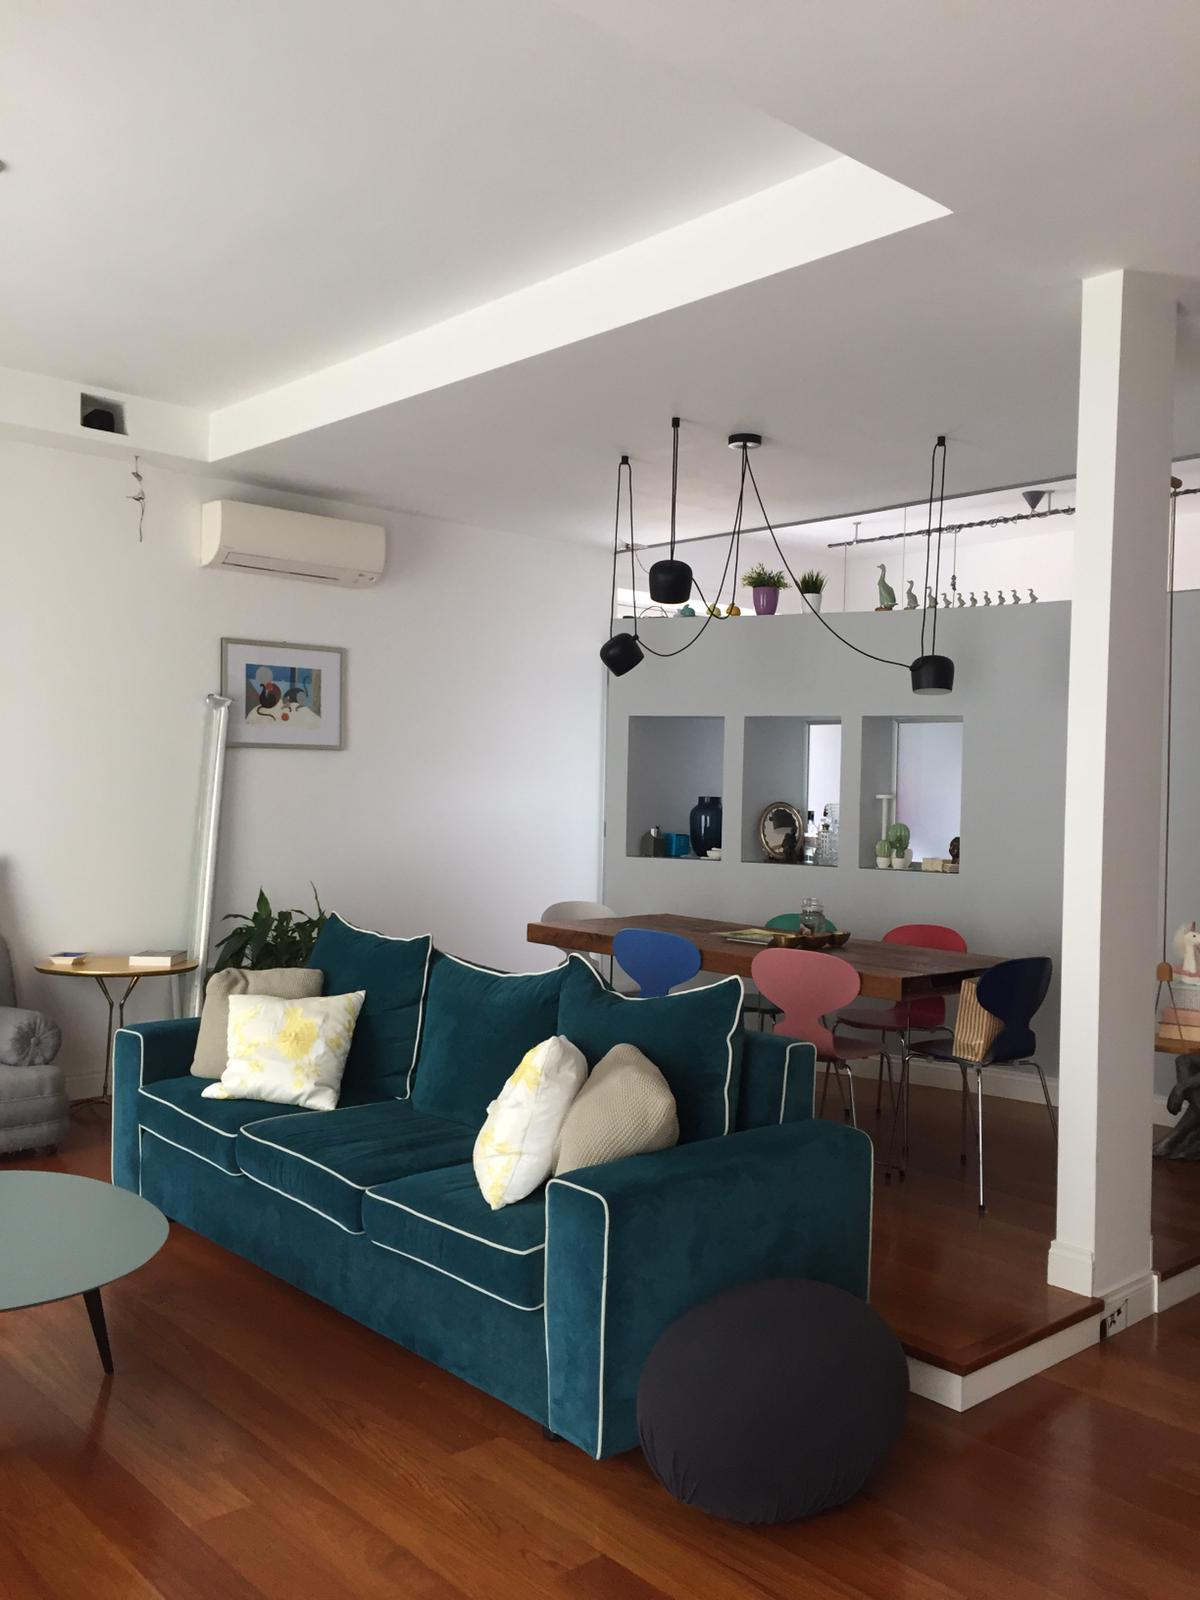 Appartamento in vendita in zona Balduina alta